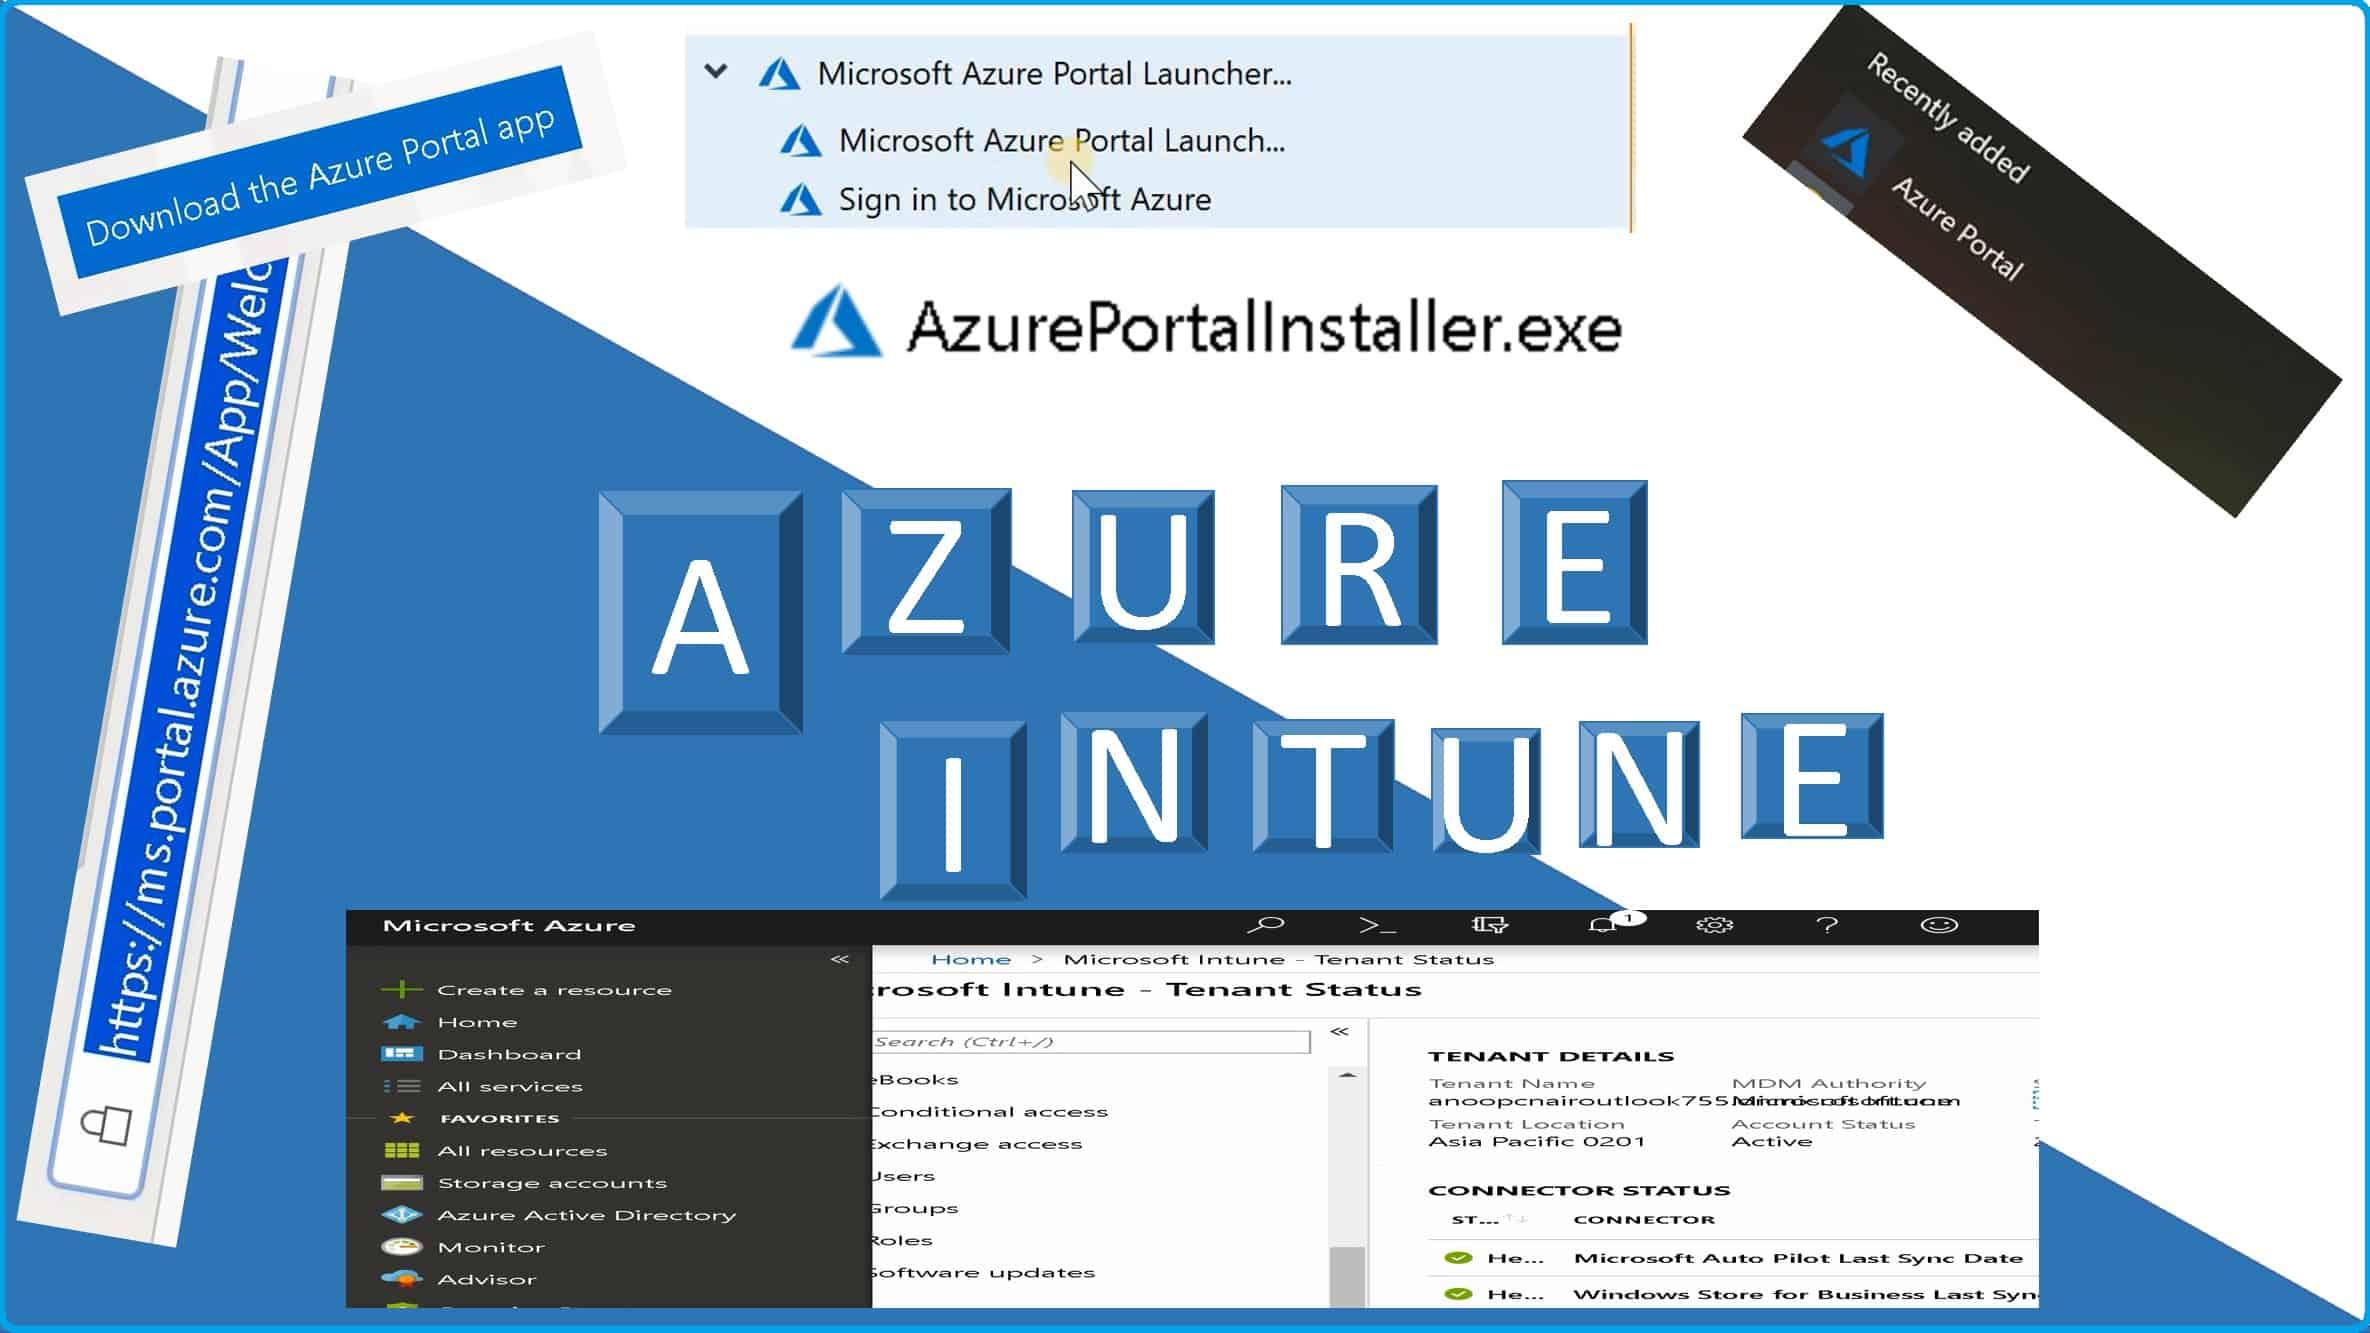 Azure Portal Application